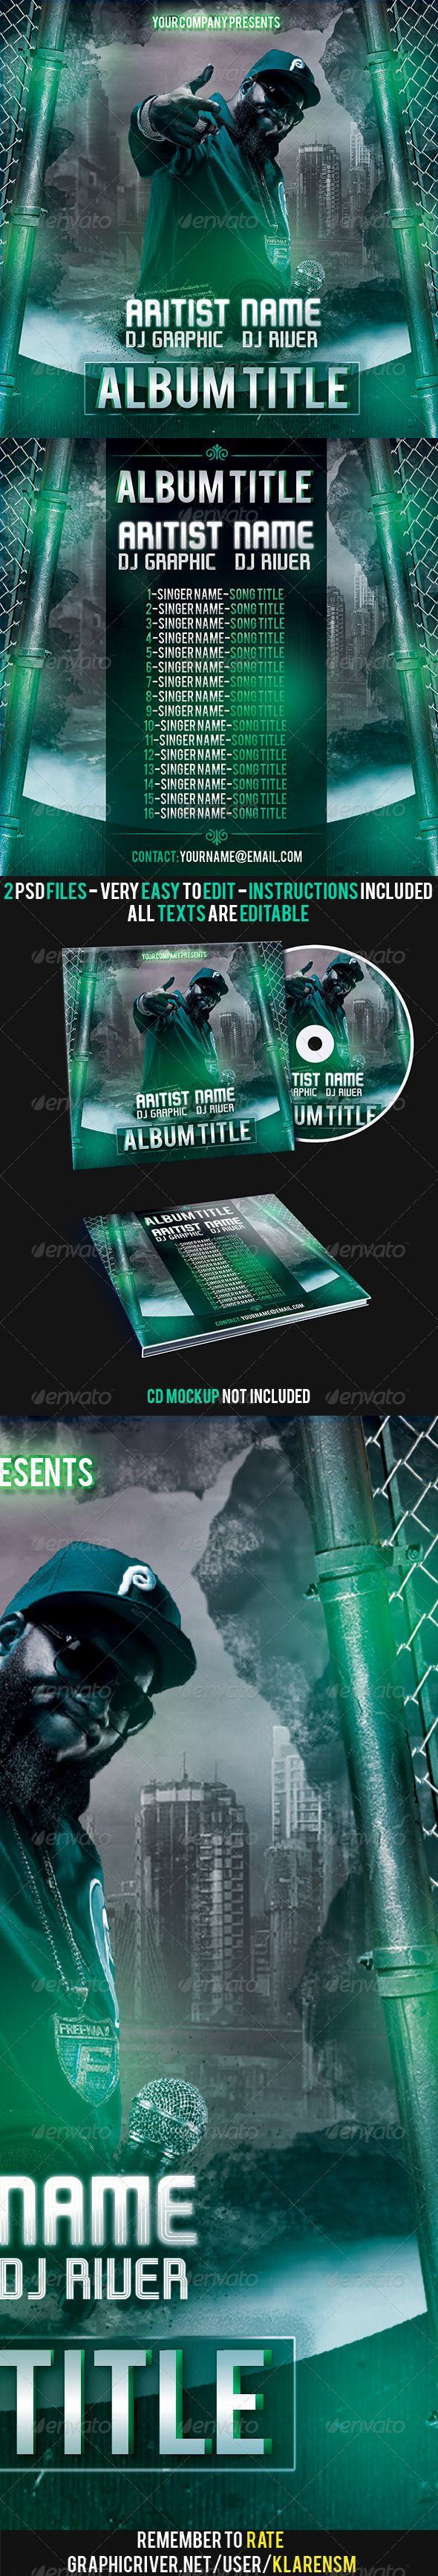 Hip Hop Rap Album Mixtape CD Cover Template | Cd cover template, Cd ...